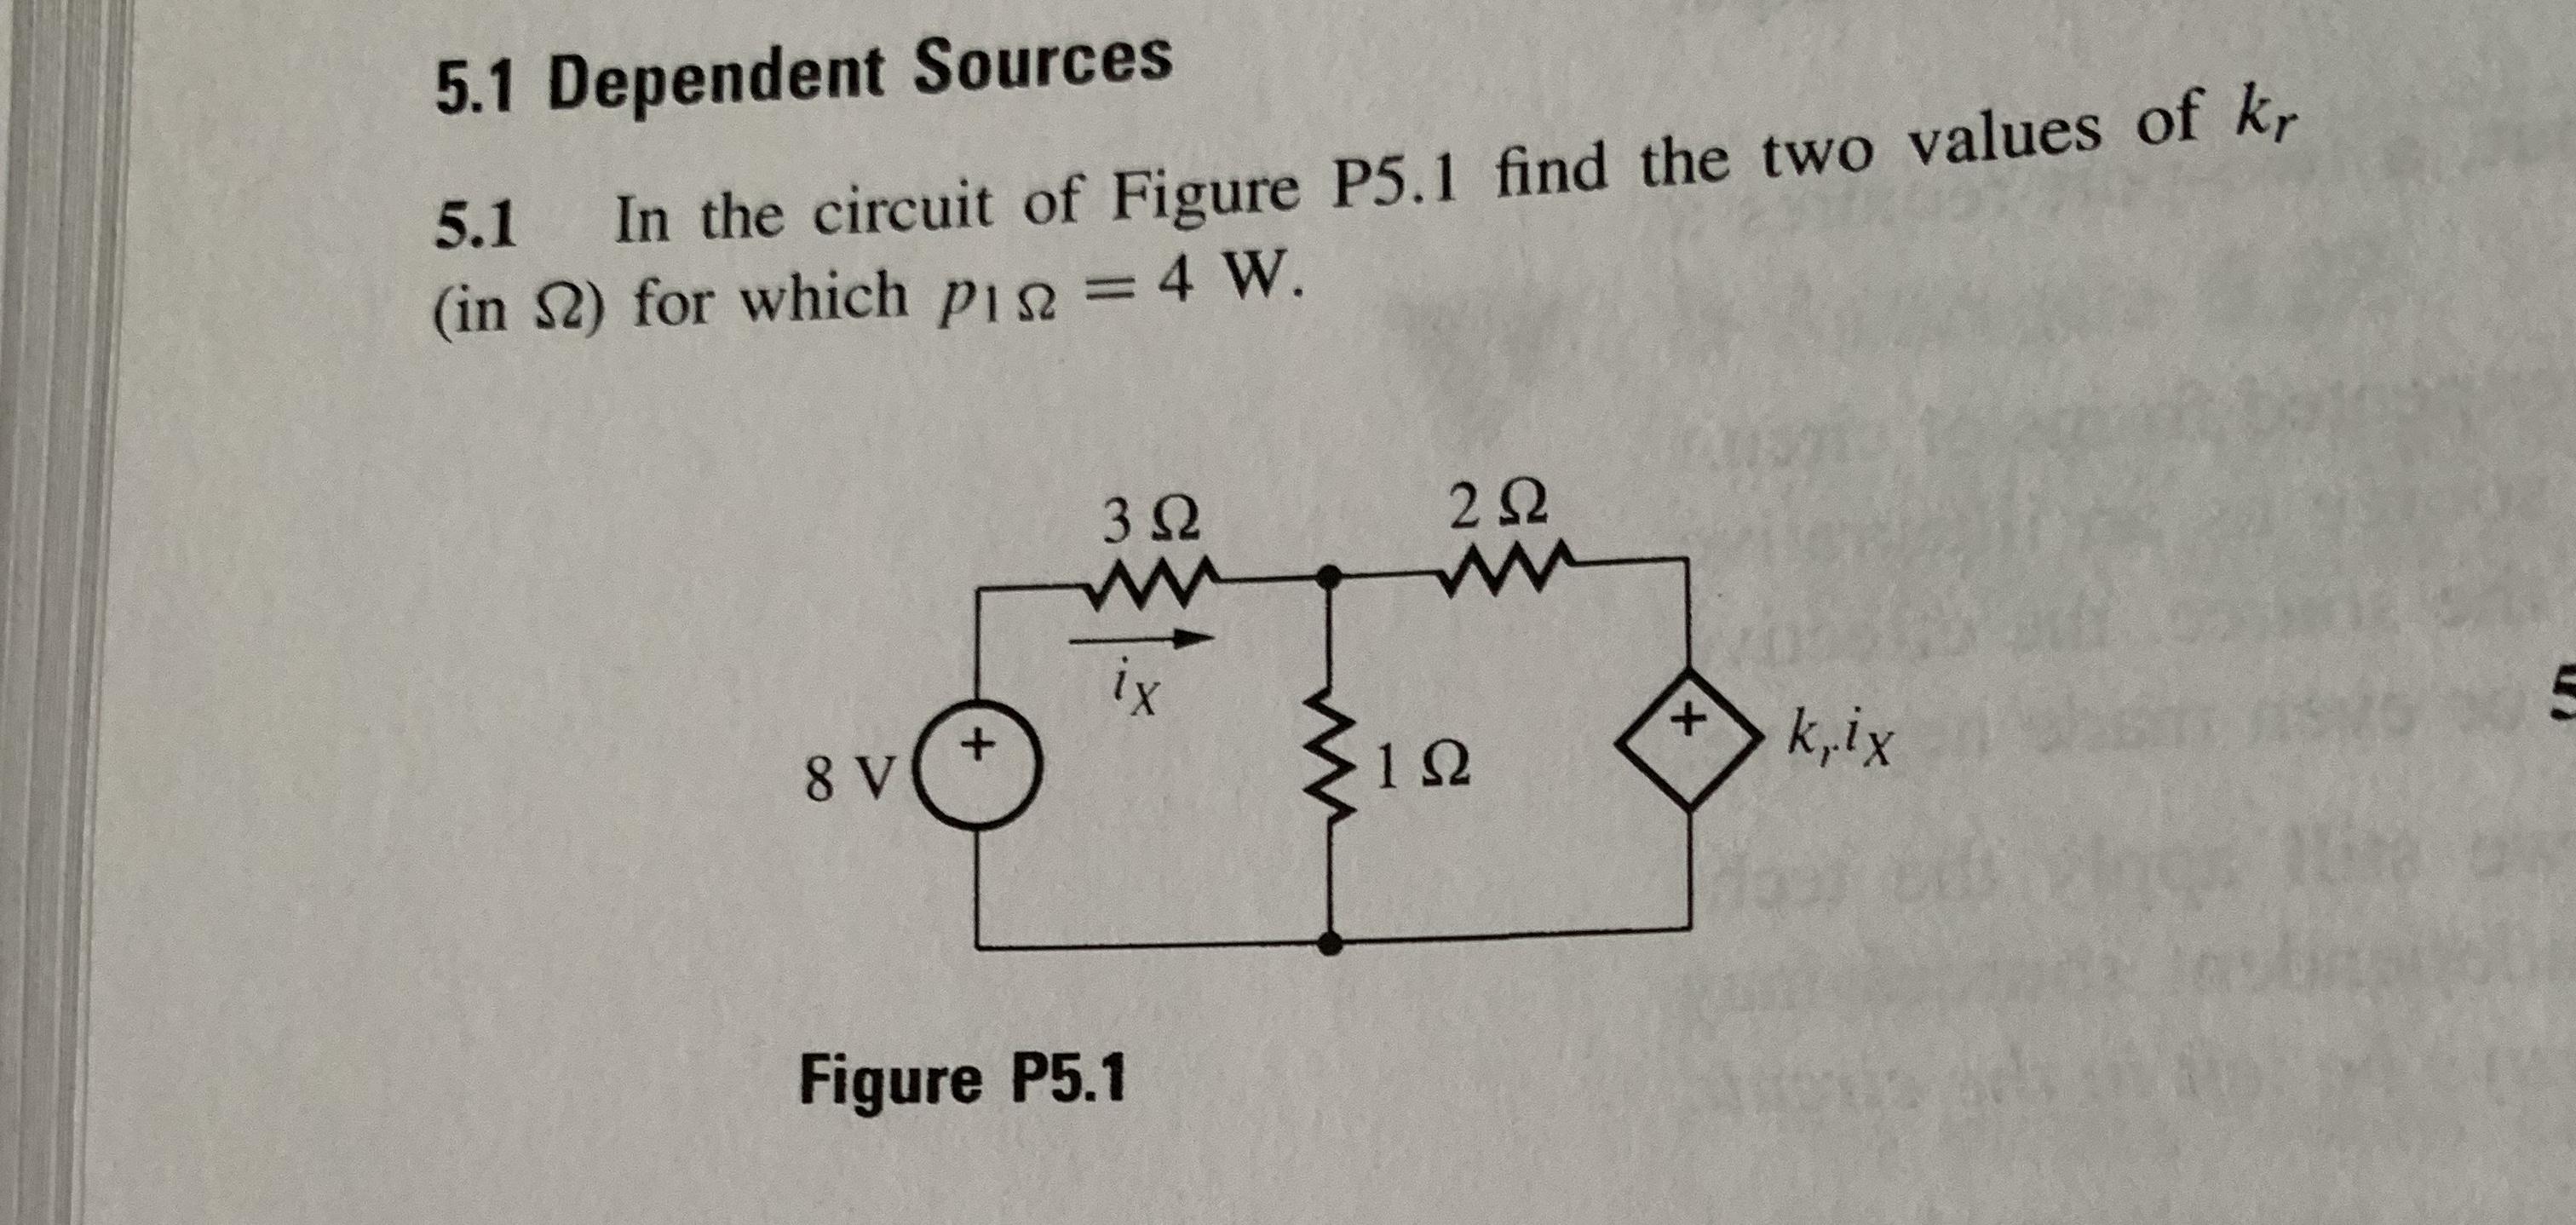 5.1 Dependent Sources 5.1 In the circuit of Figure P5.1 find the two values of kr (in S) for which pi= 4 W. 2 Q 3Ω ix k,ix 8 V 1Ω Figure P5.1